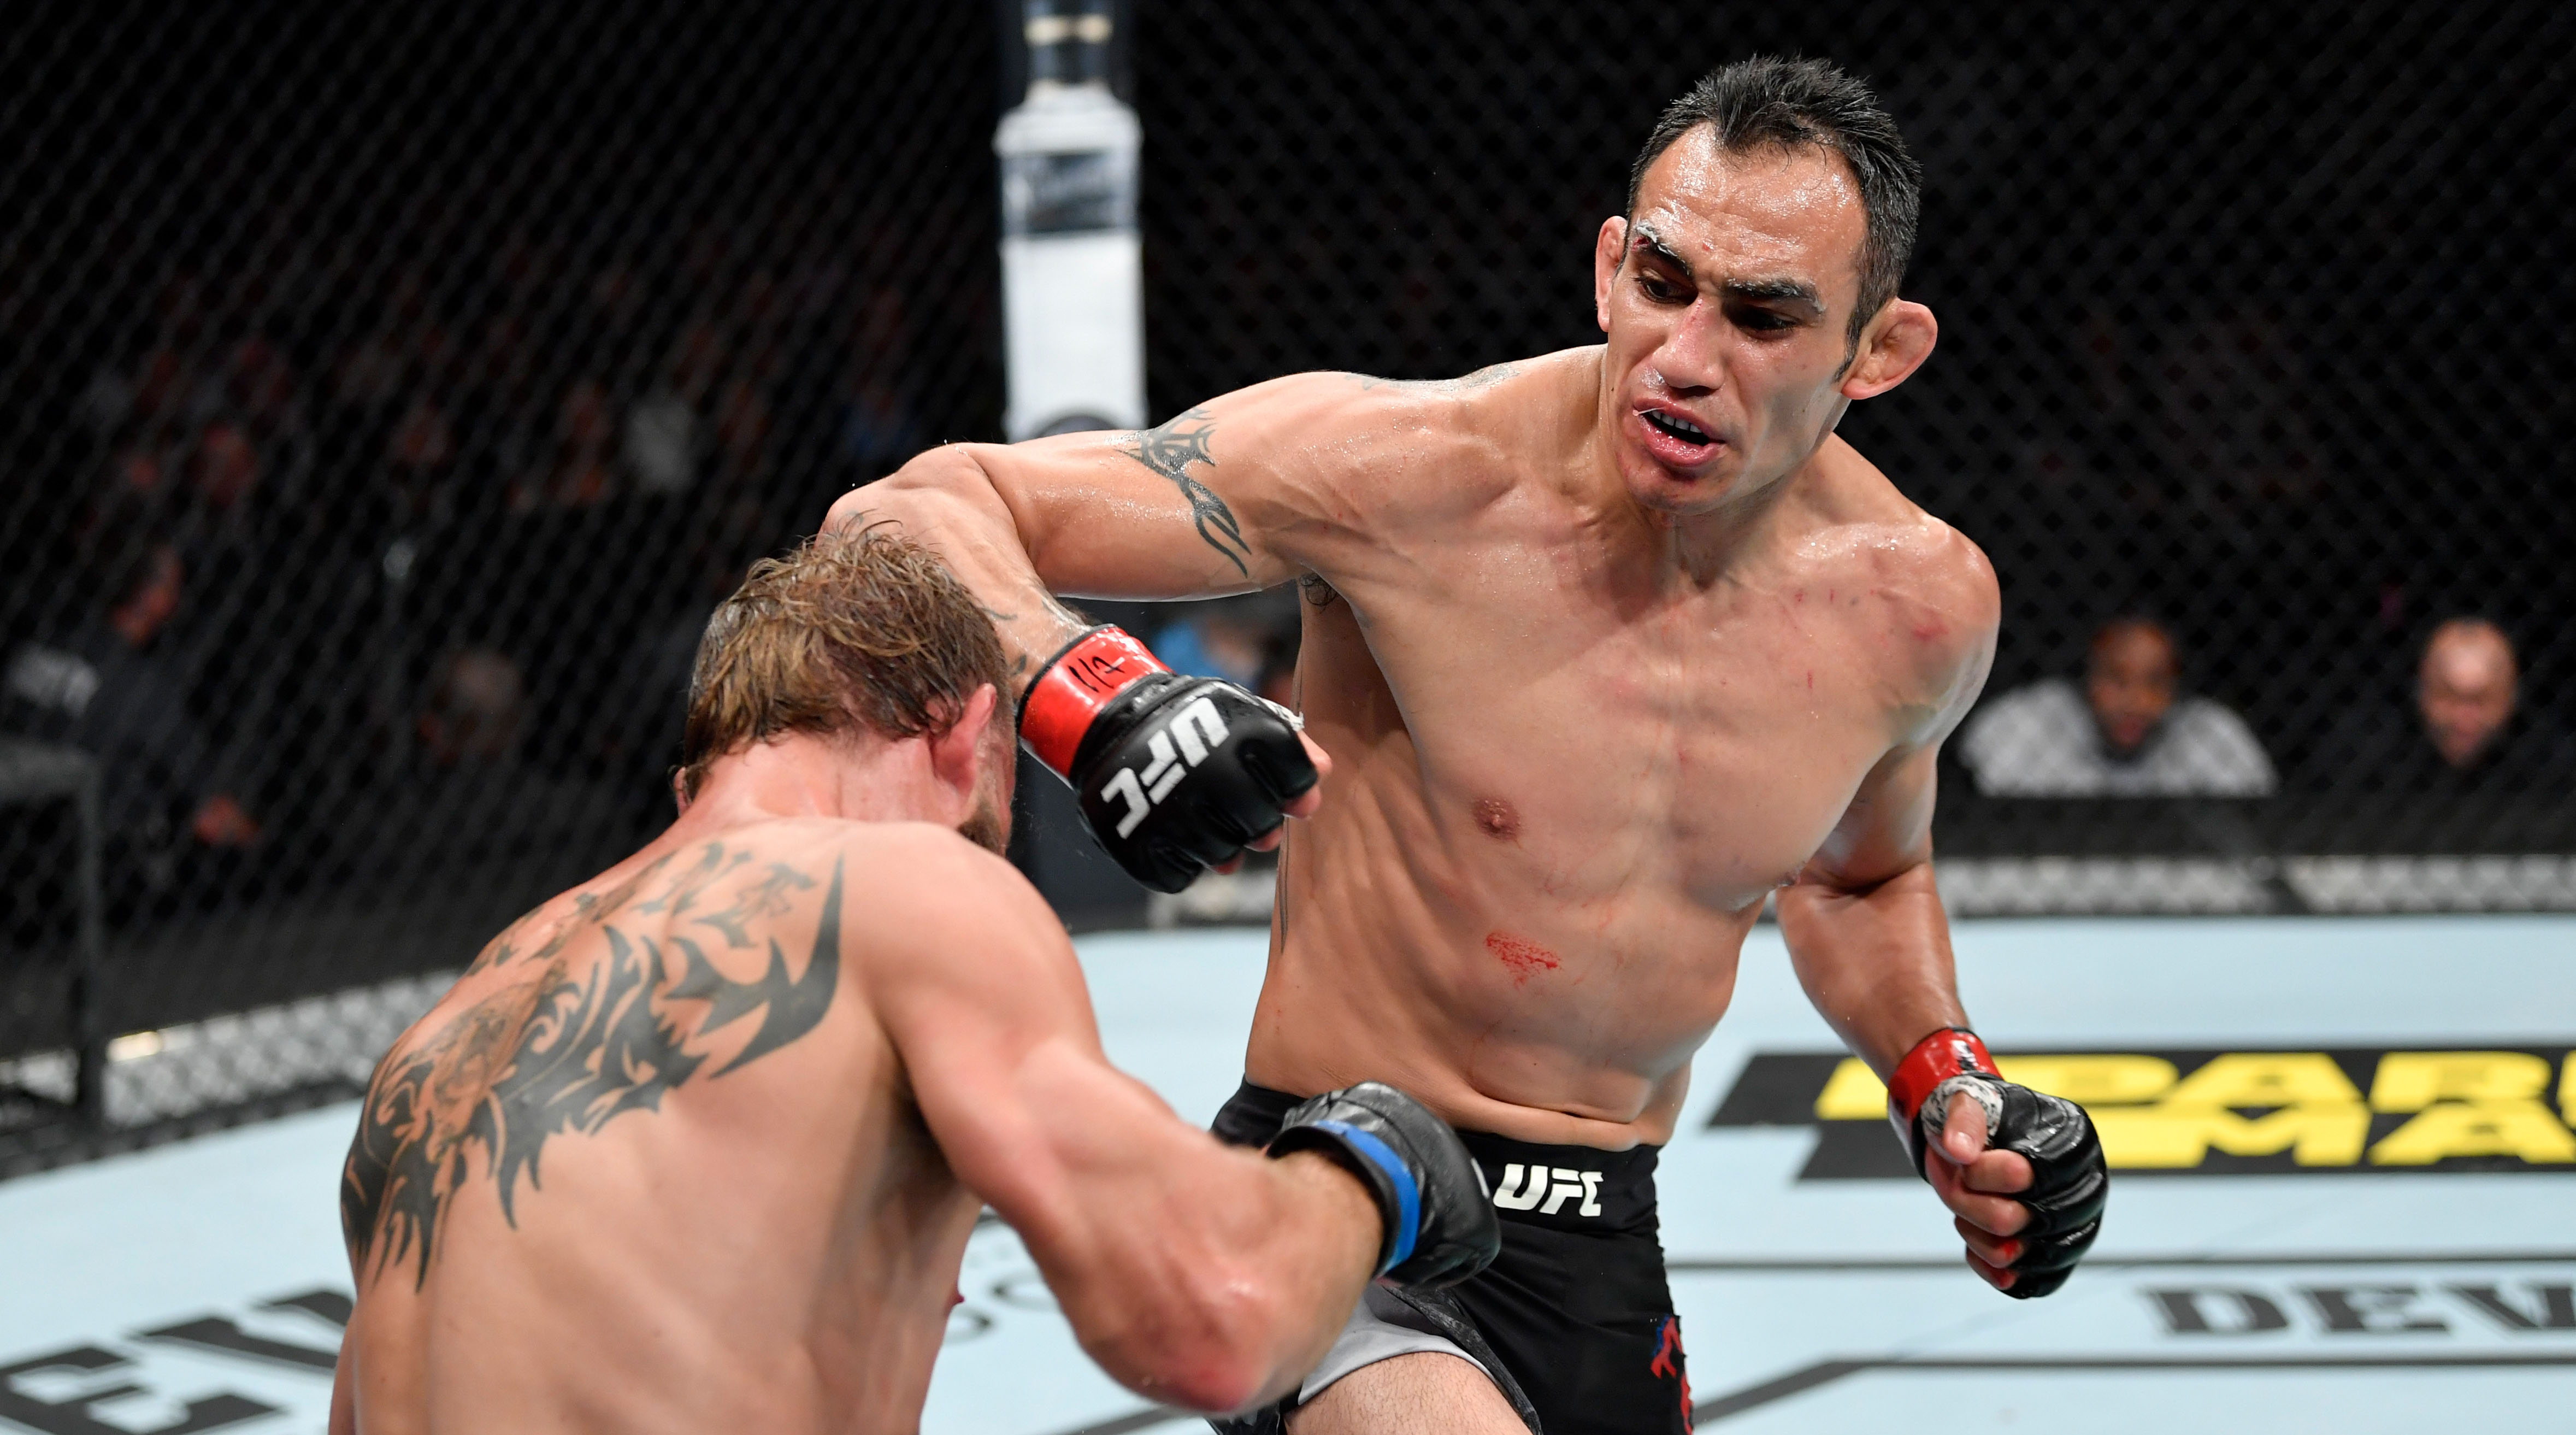 UFC 238: Ferguson v Cerrone